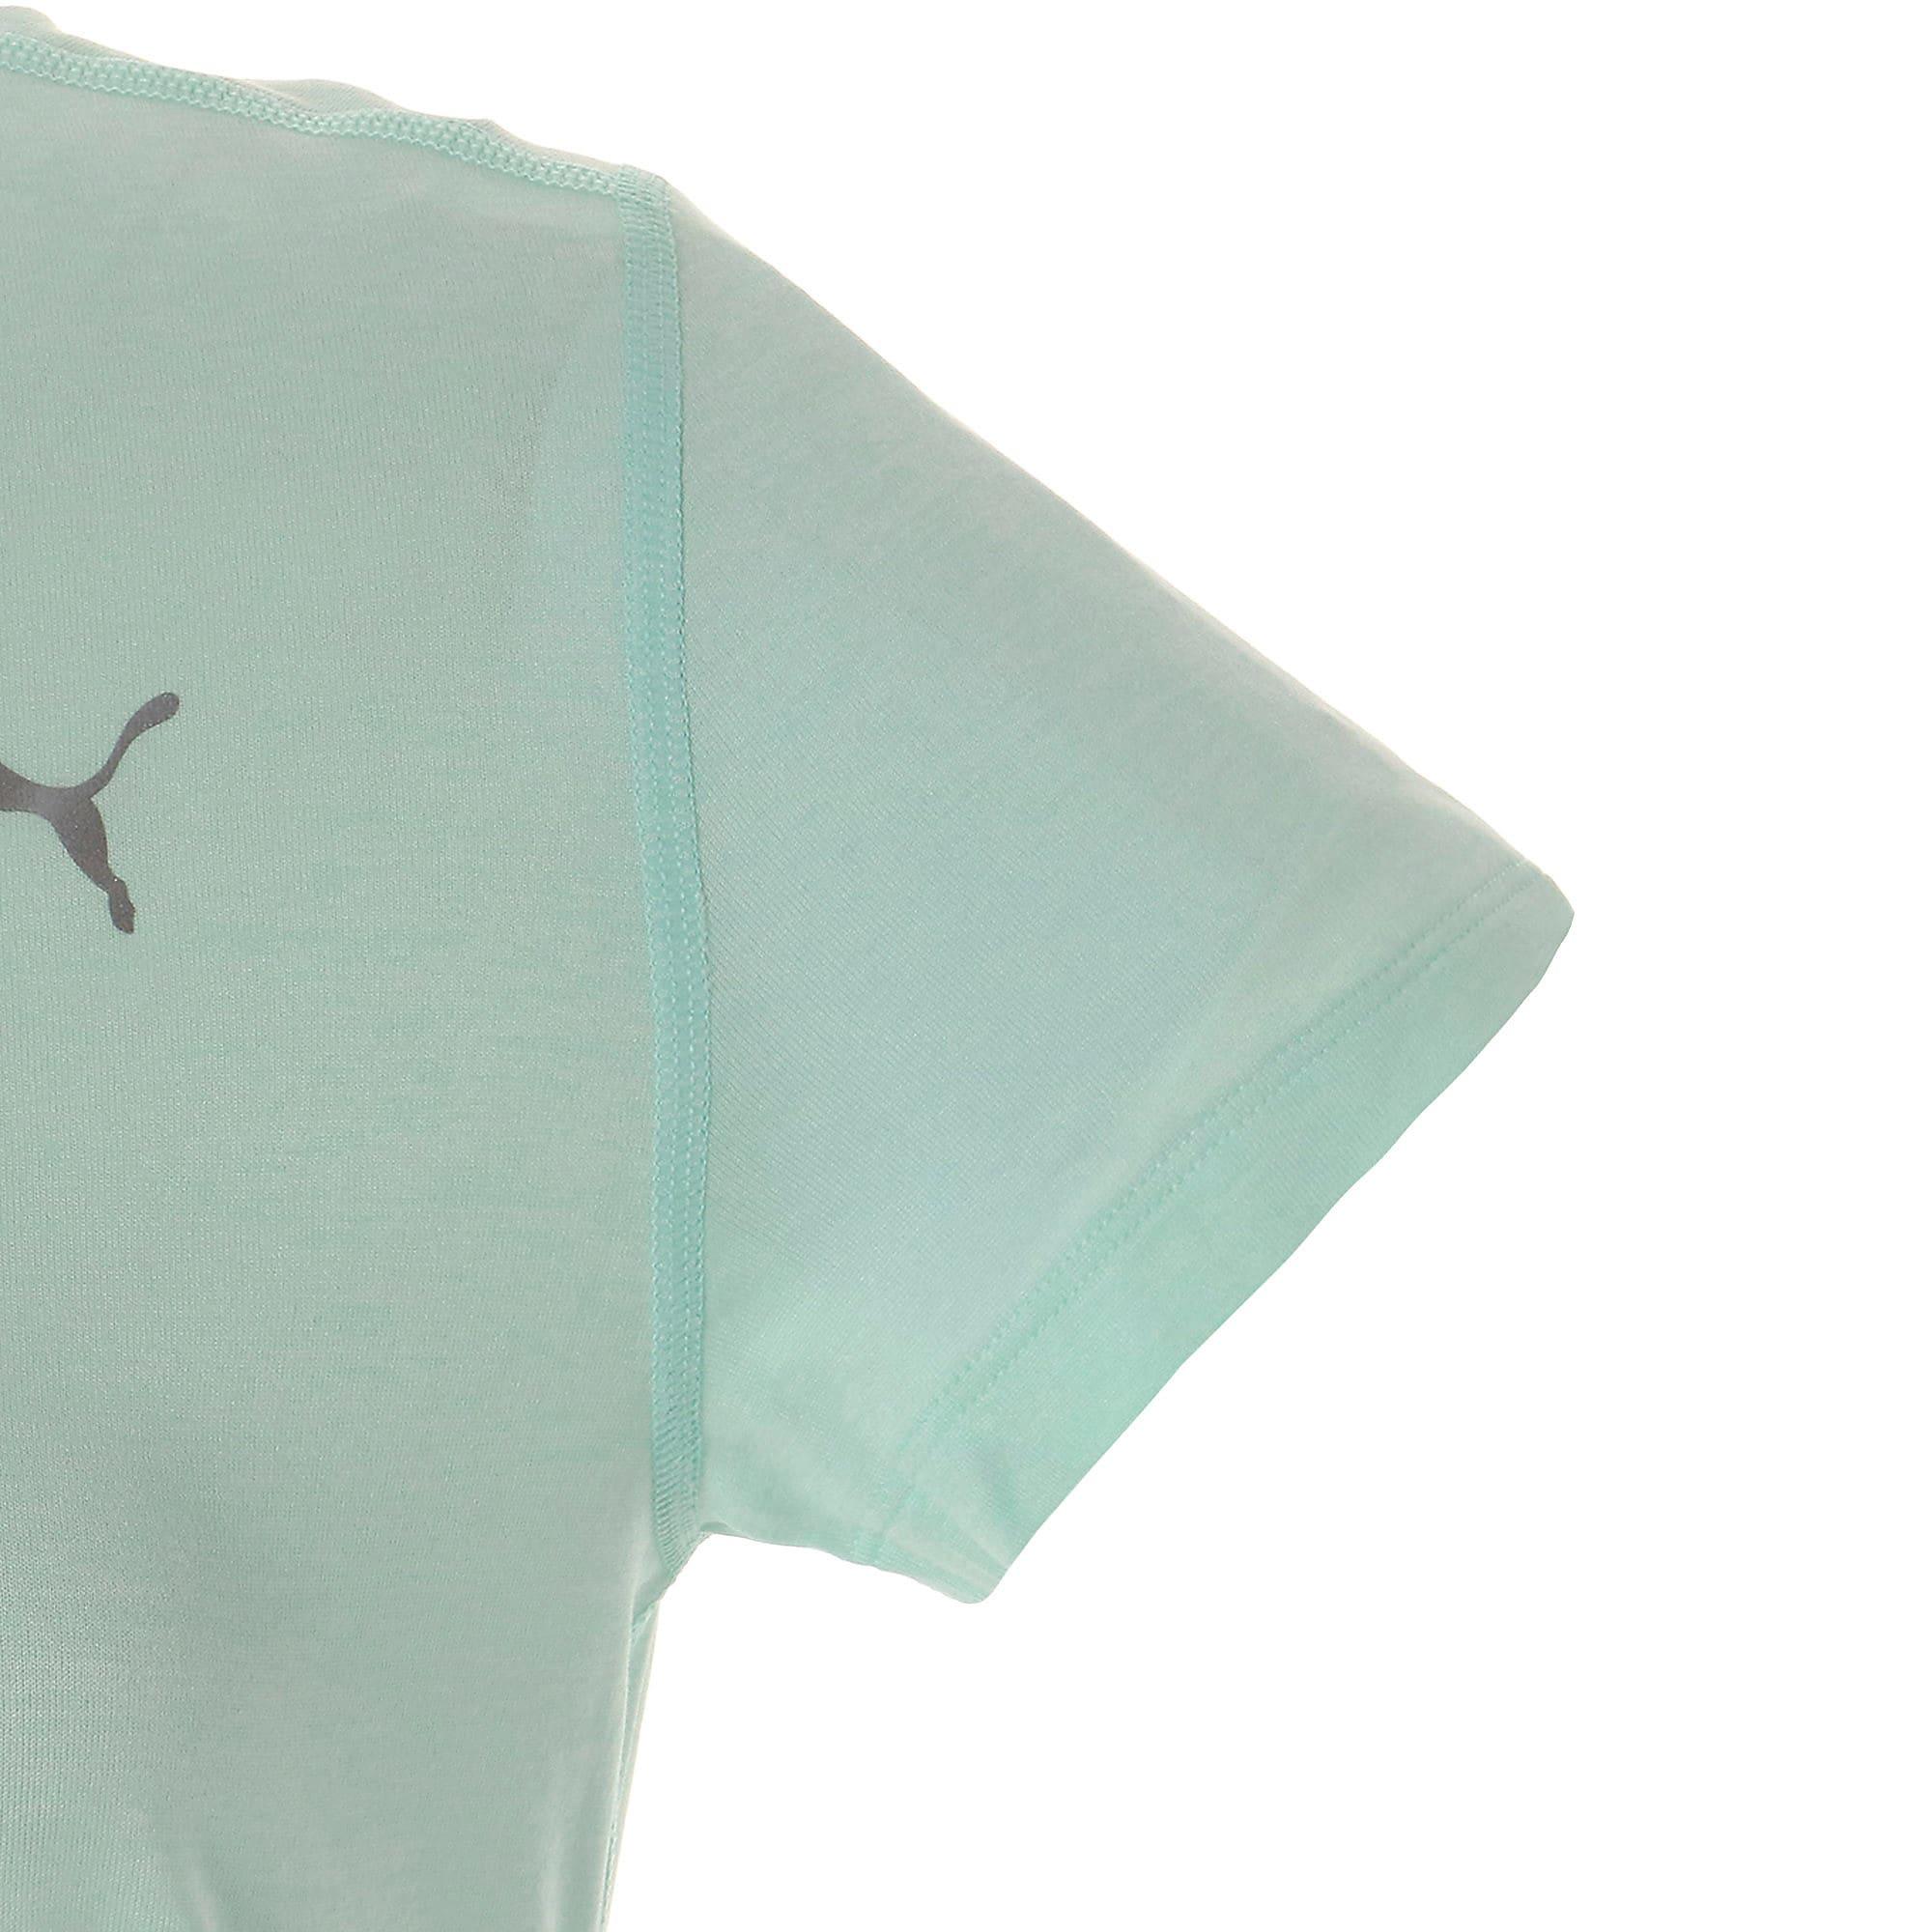 Thumbnail 4 of エピック ヘザー ウィメンズ SS Tシャツ 半袖, Fair Aqua Heather, medium-JPN